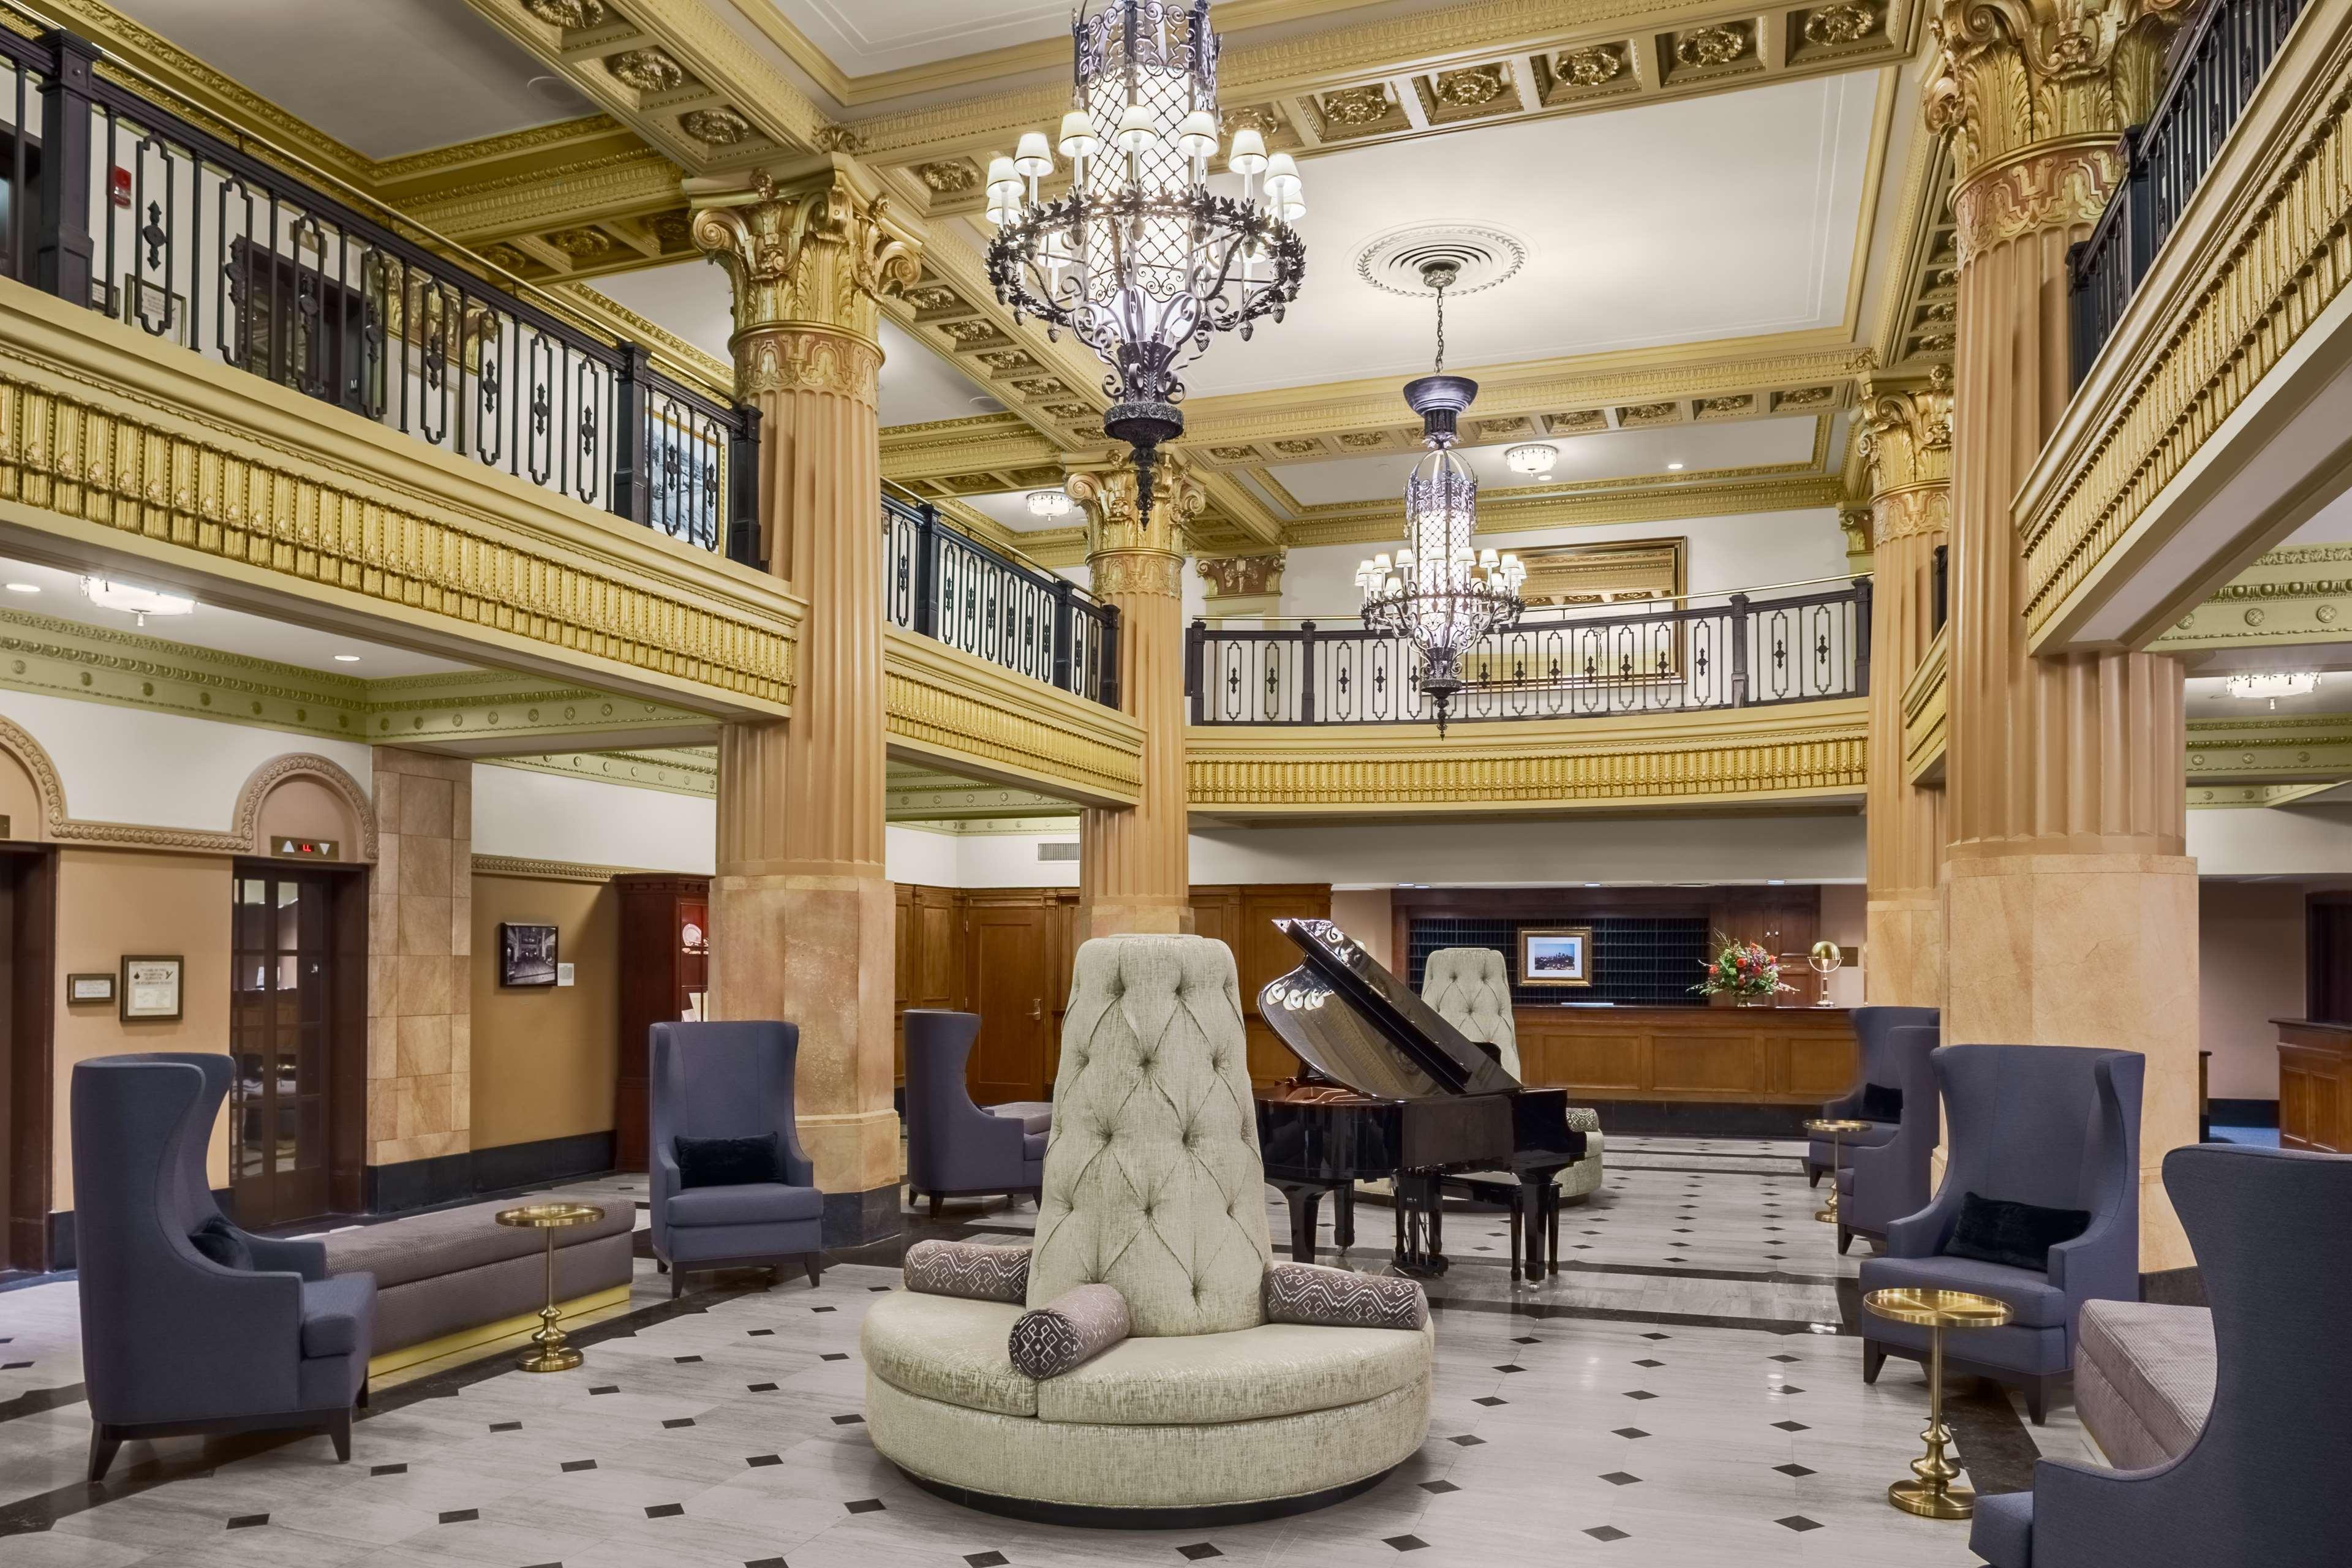 Hilton President Kansas City image 7